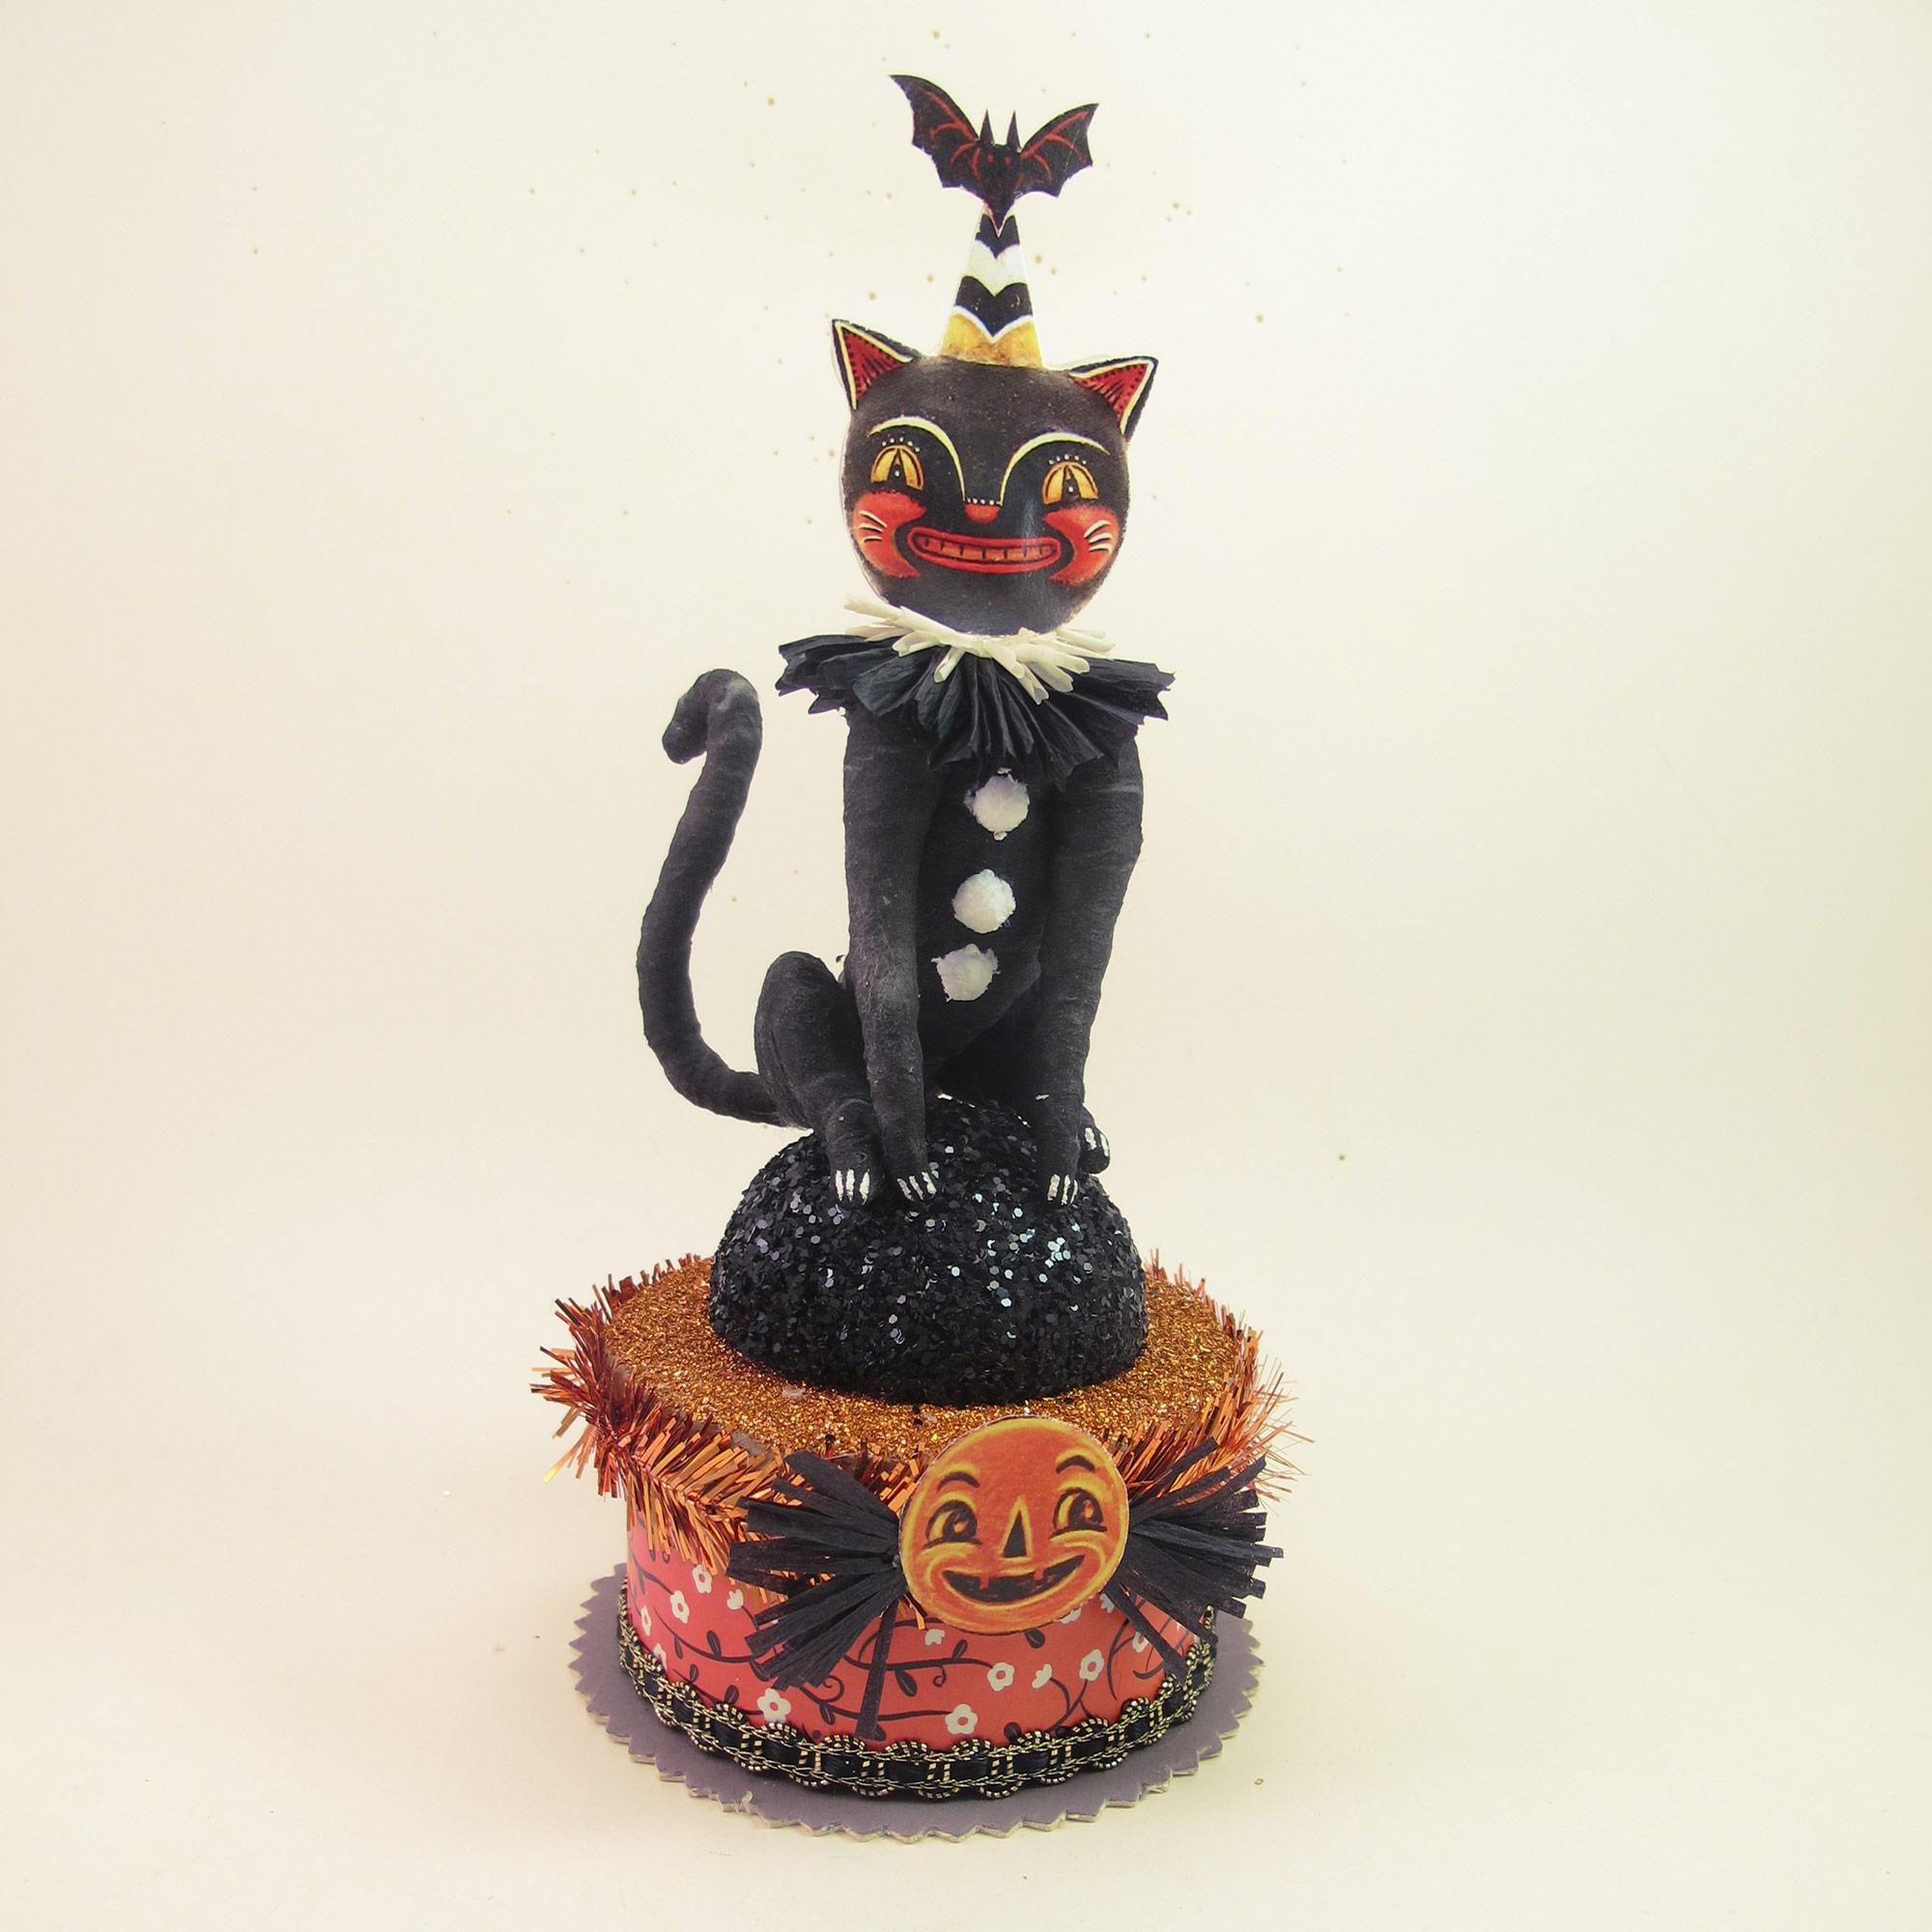 JPD Partners in Craft * Vintage by Crystal + Johanna Parker Design * Artist Collaboration